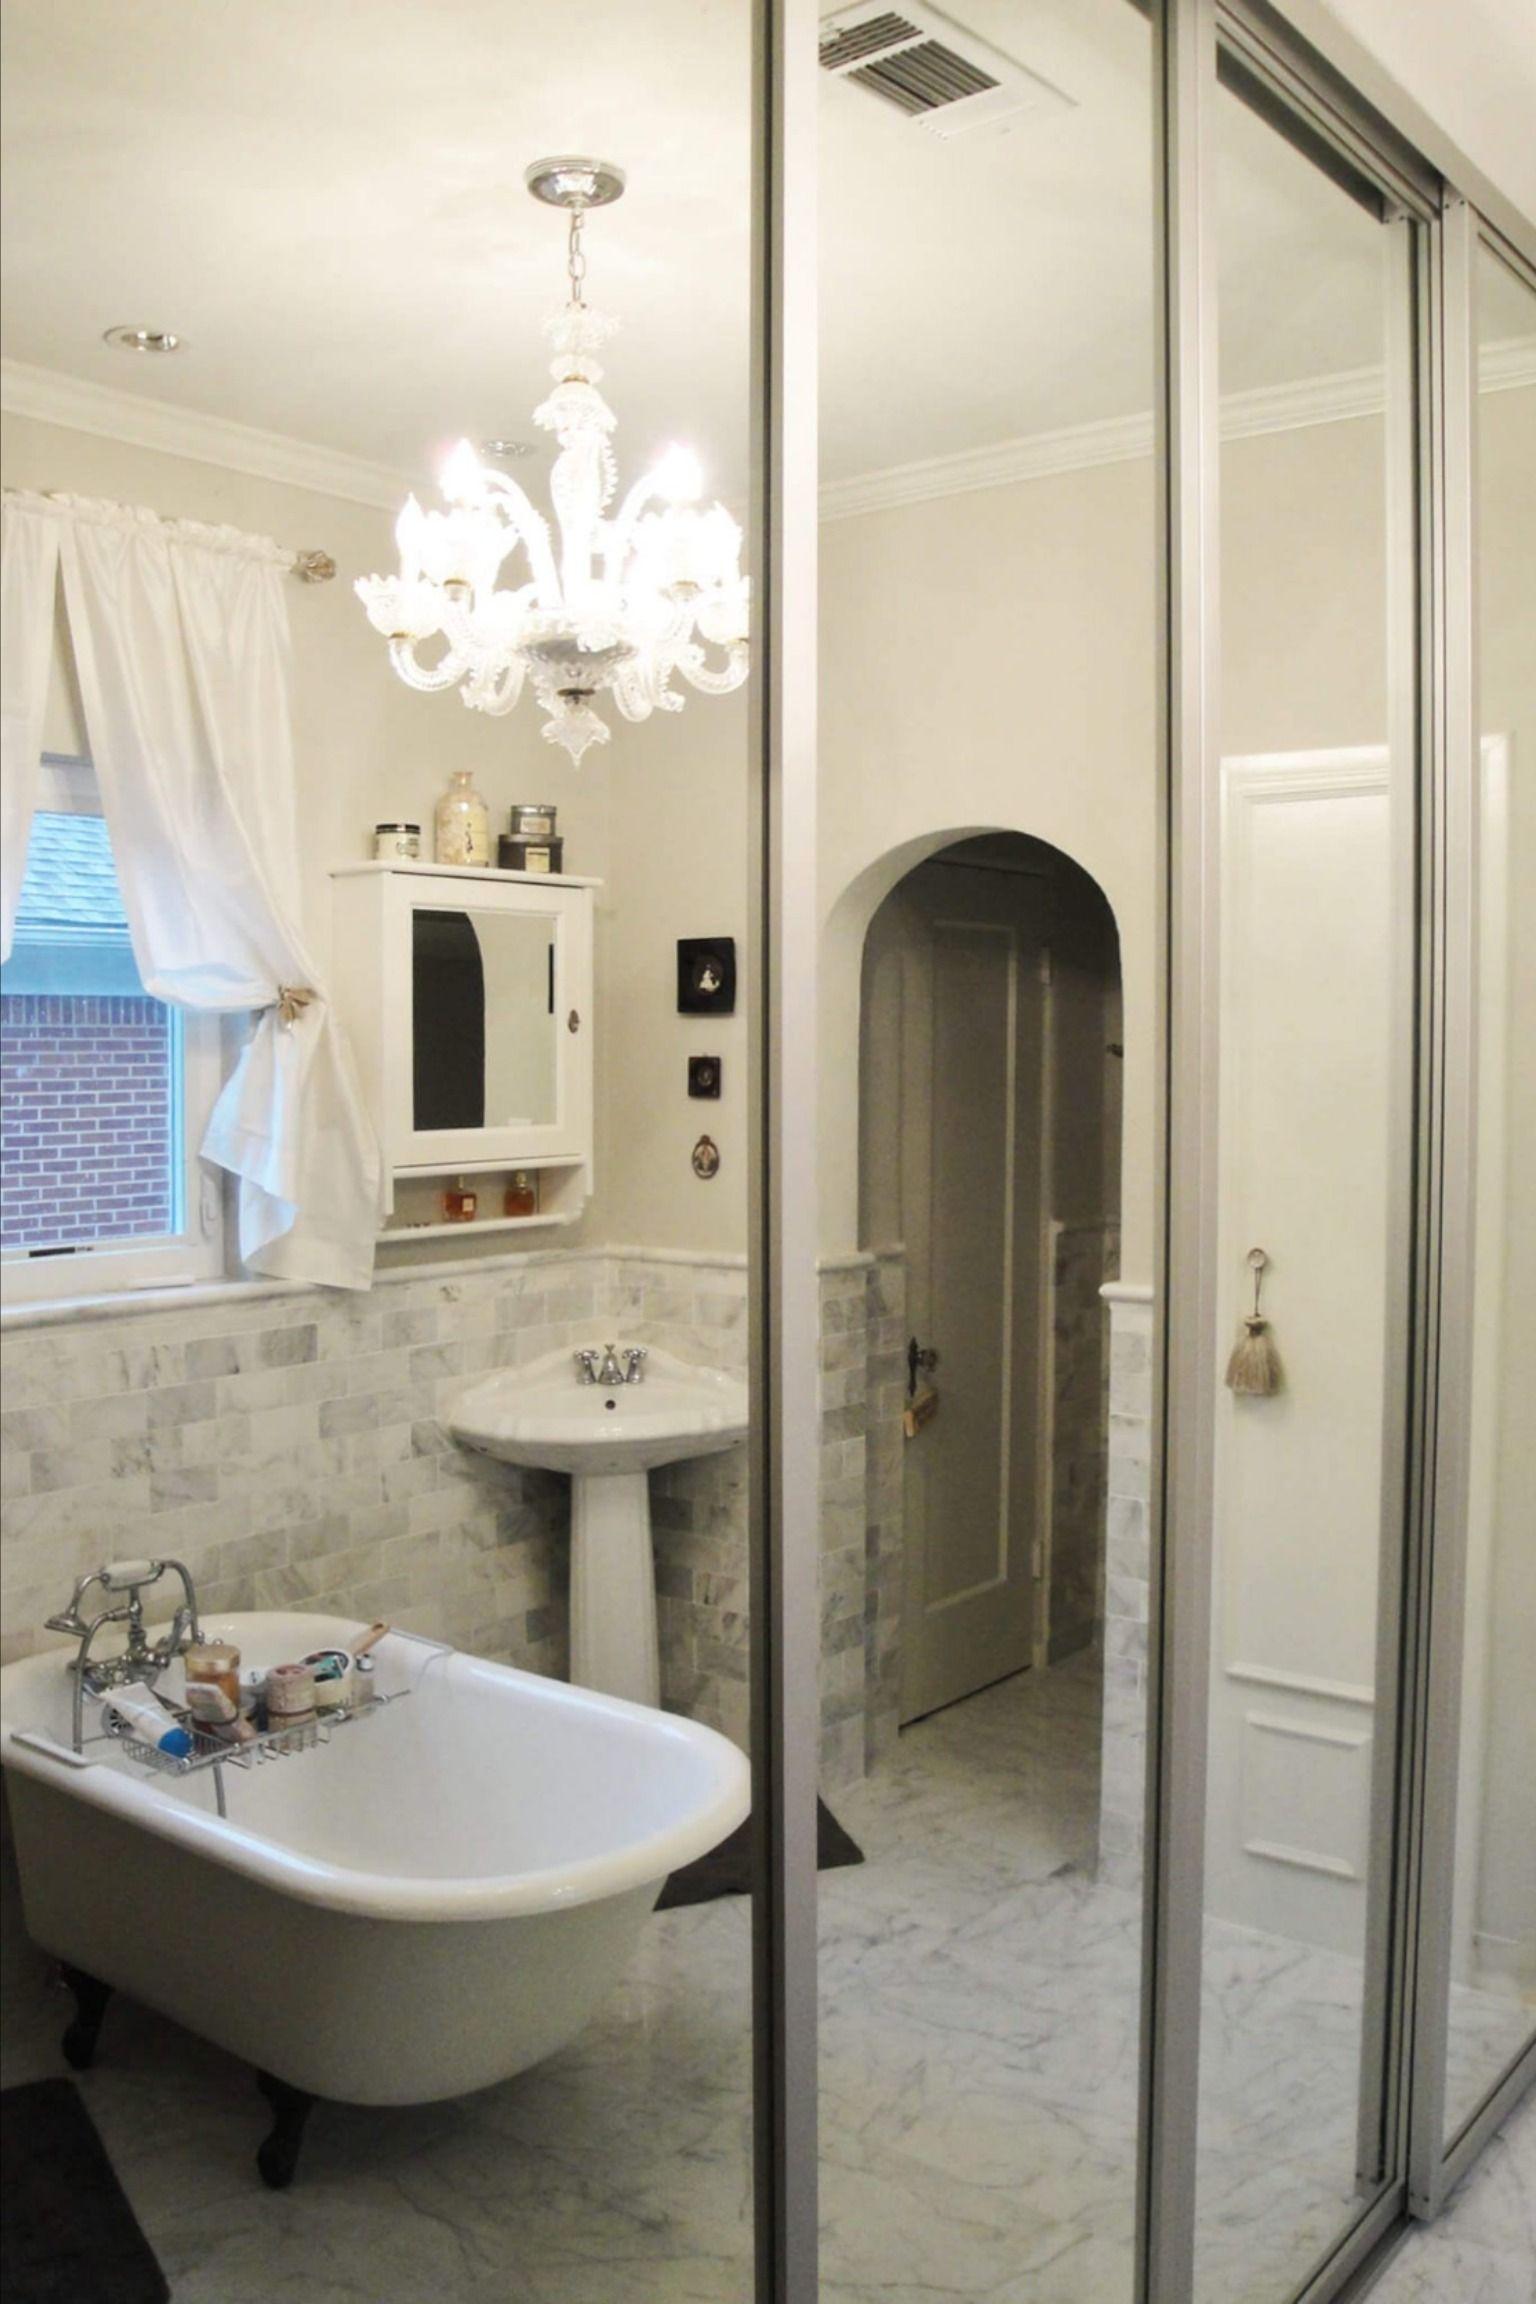 Mirrored Doors Will Make Your Tiny Guest Bathroom Appear Larger In 2020 Glass Closet Glass Closet Doors Door Design Interior